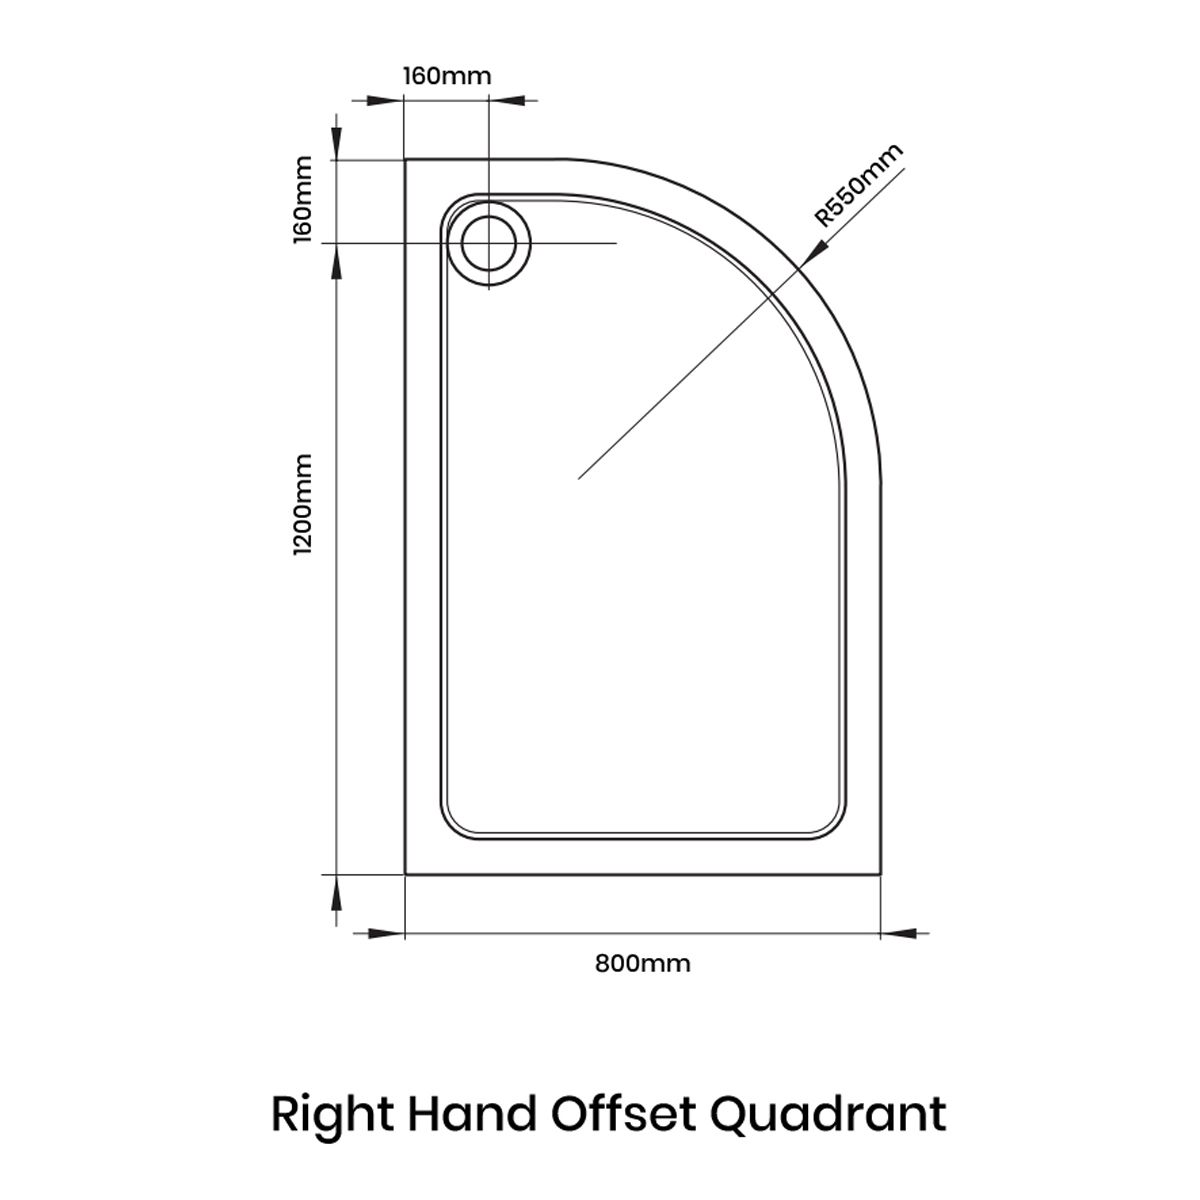 Aquadart Offset Quadrant 1200 x 800 Shower Tray Right Handed Line Drawing